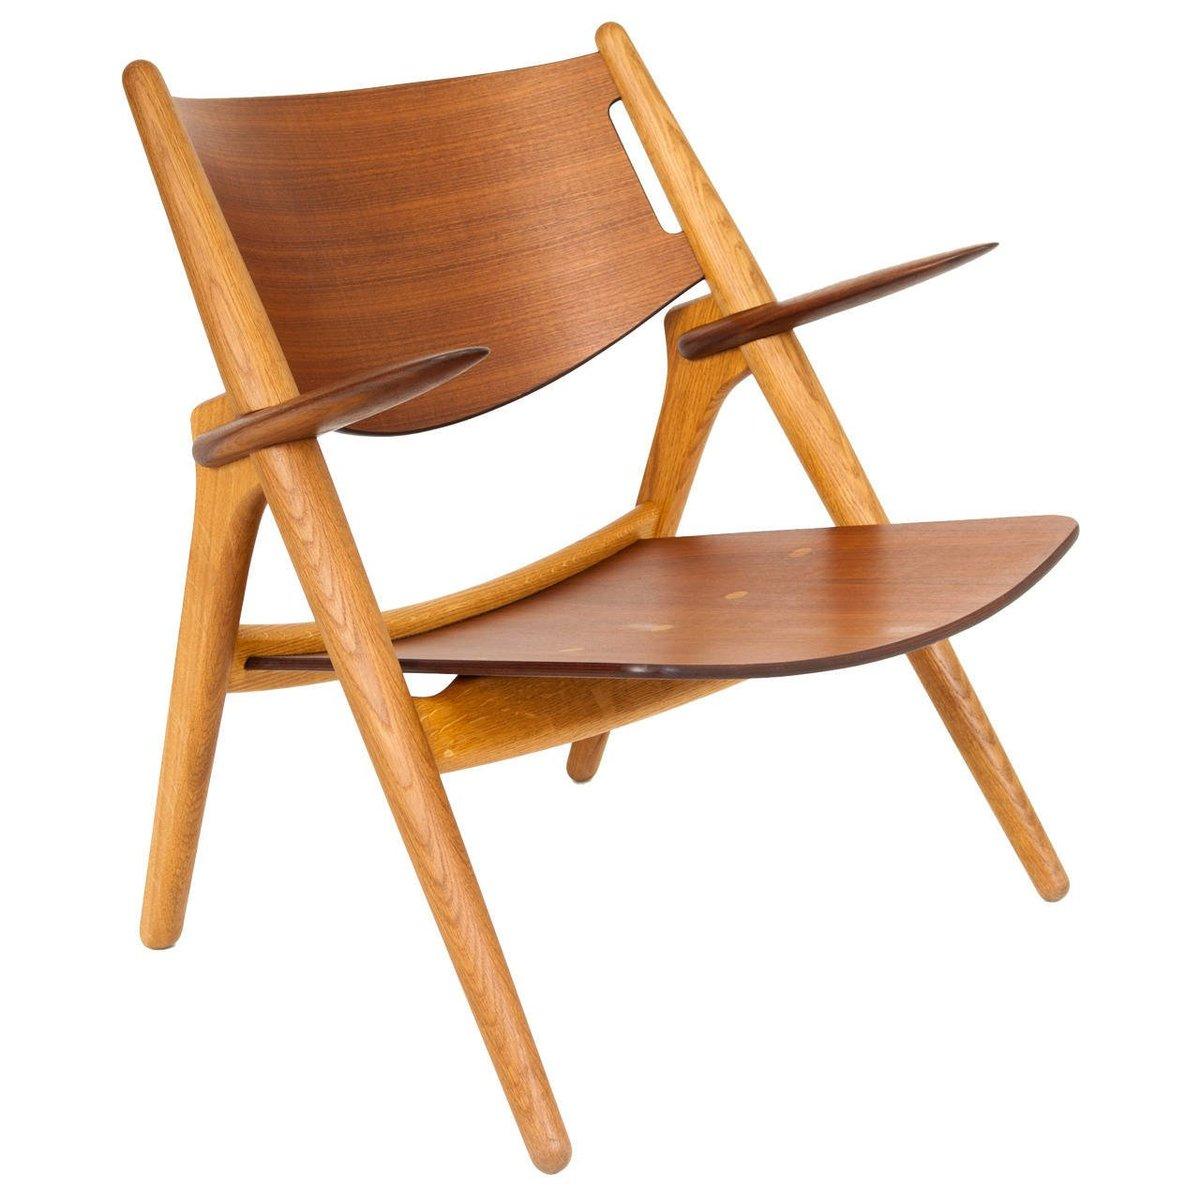 Vintage Modell CH28 Sessel von Hans J. Wegner